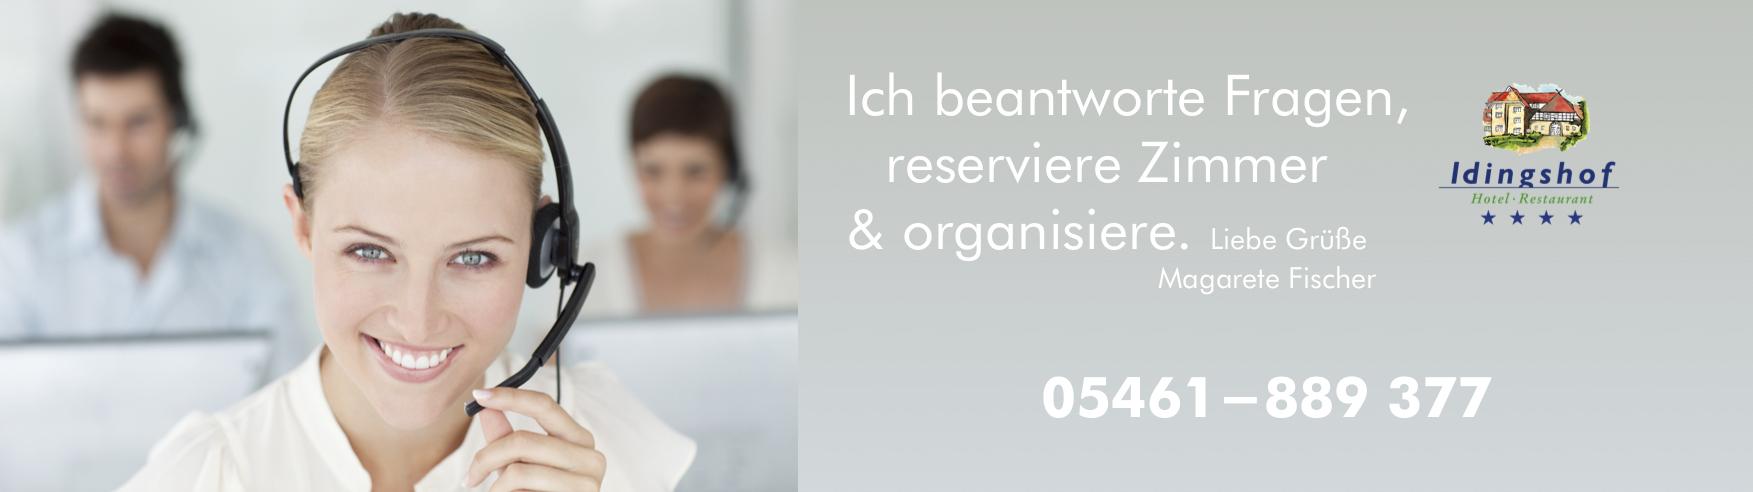 Hotel Bramsche idingshof Zimmer reservierung.jpg